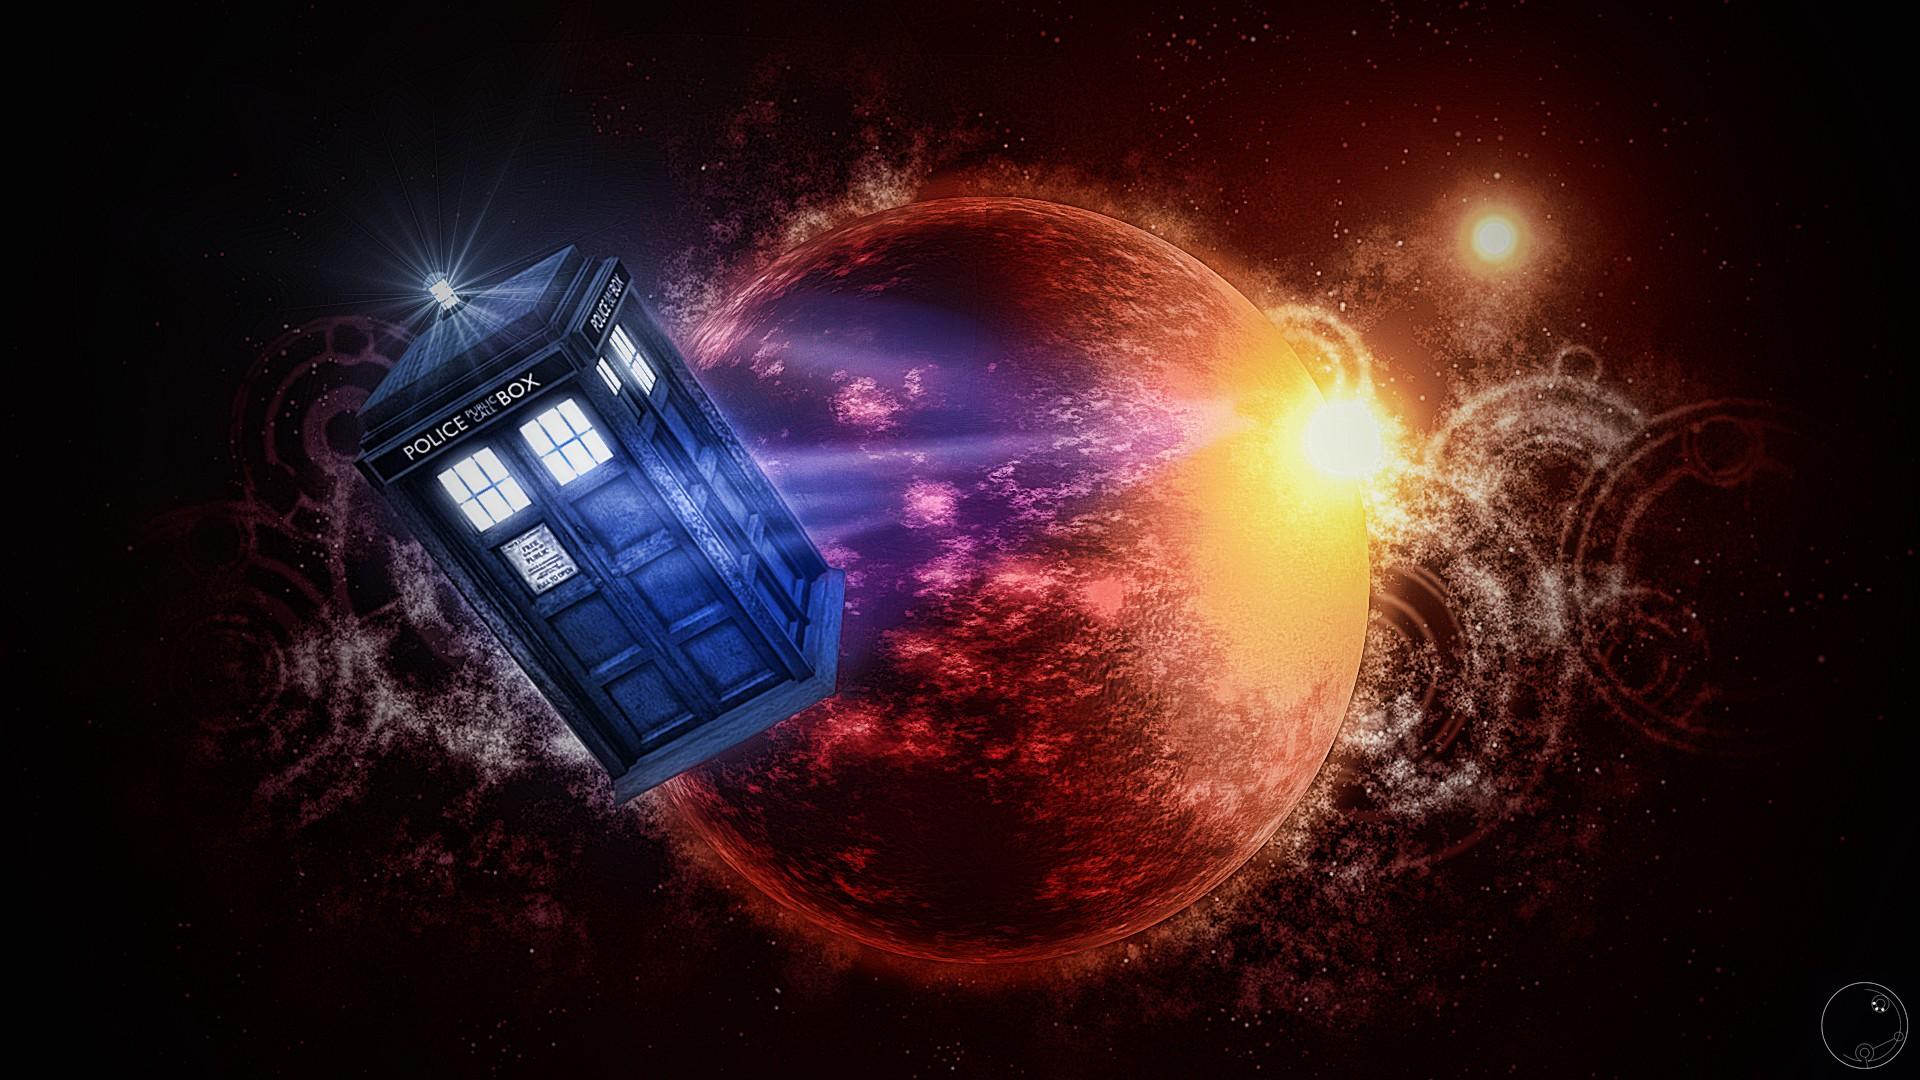 Wallpaper 1920x1080 Px Artwork Doctor Who Tardis The